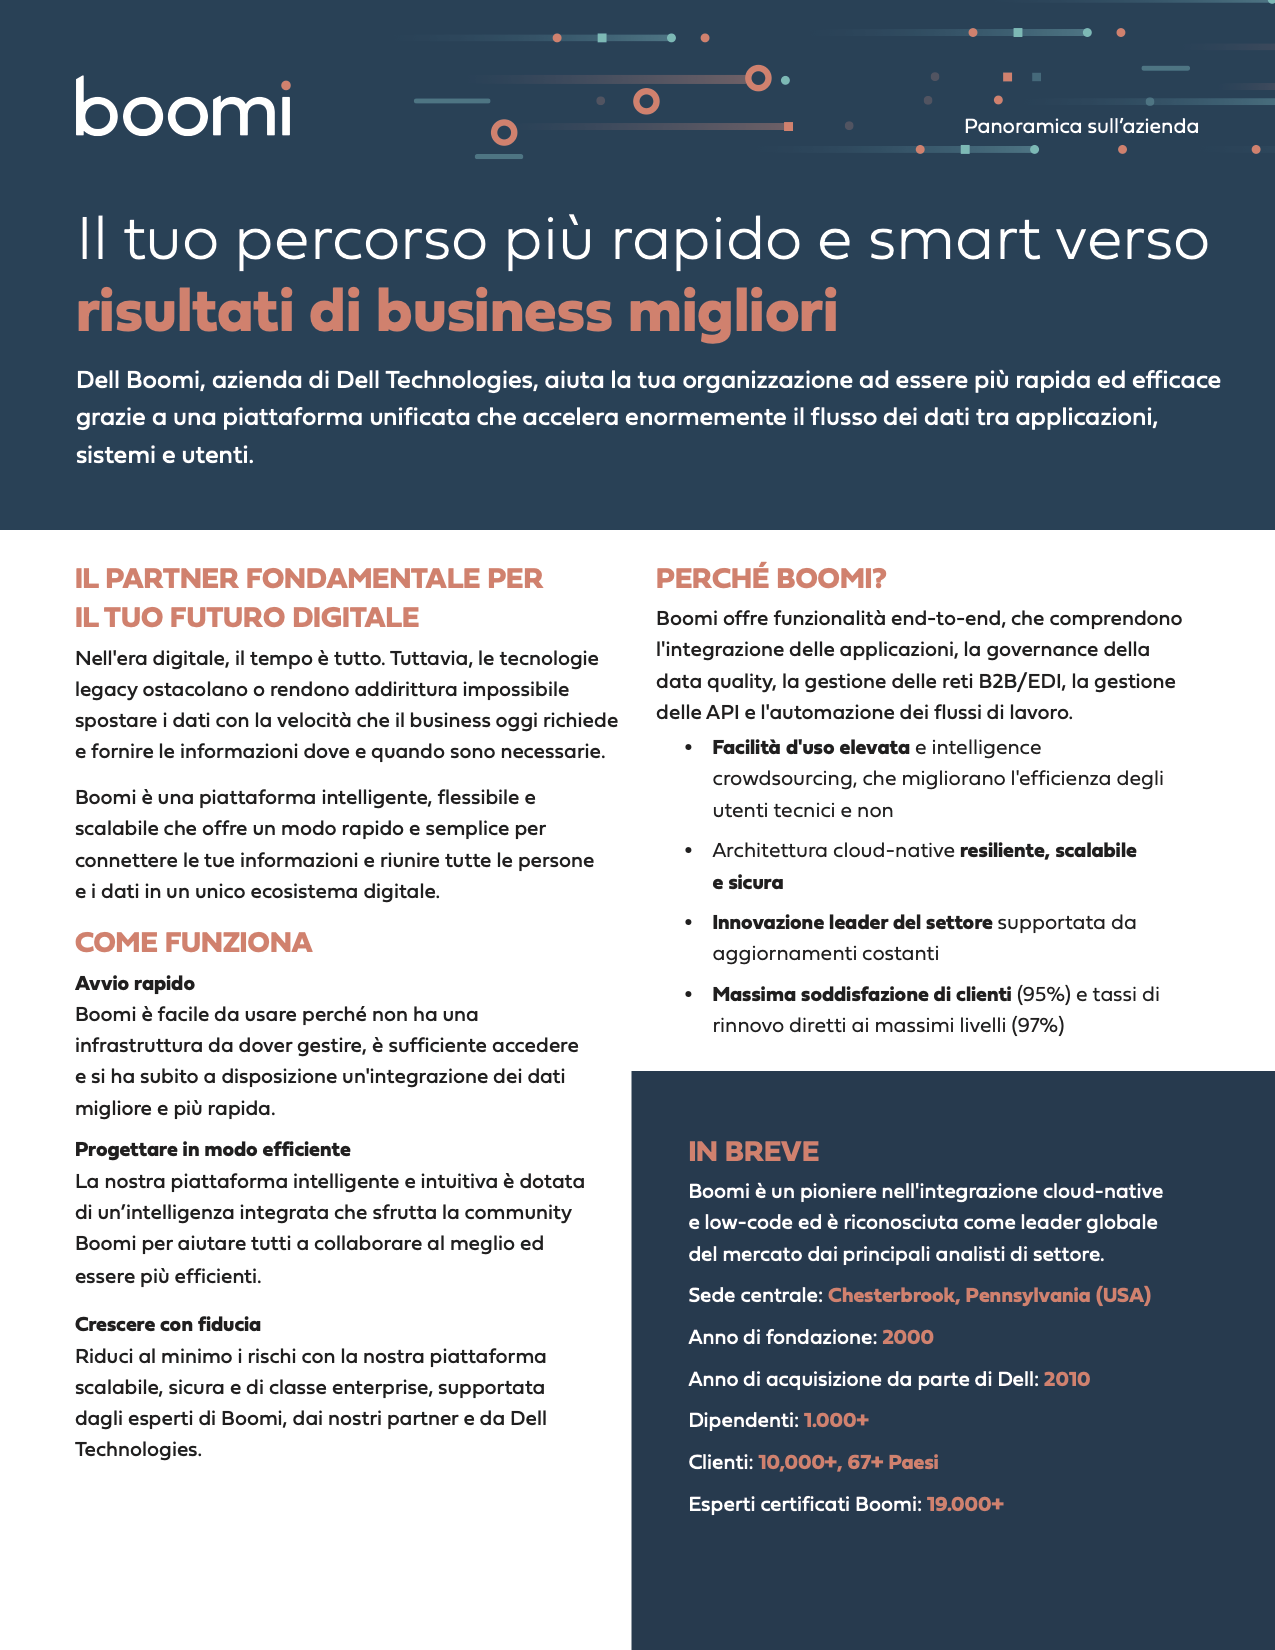 Boomi Company Overview - Italian